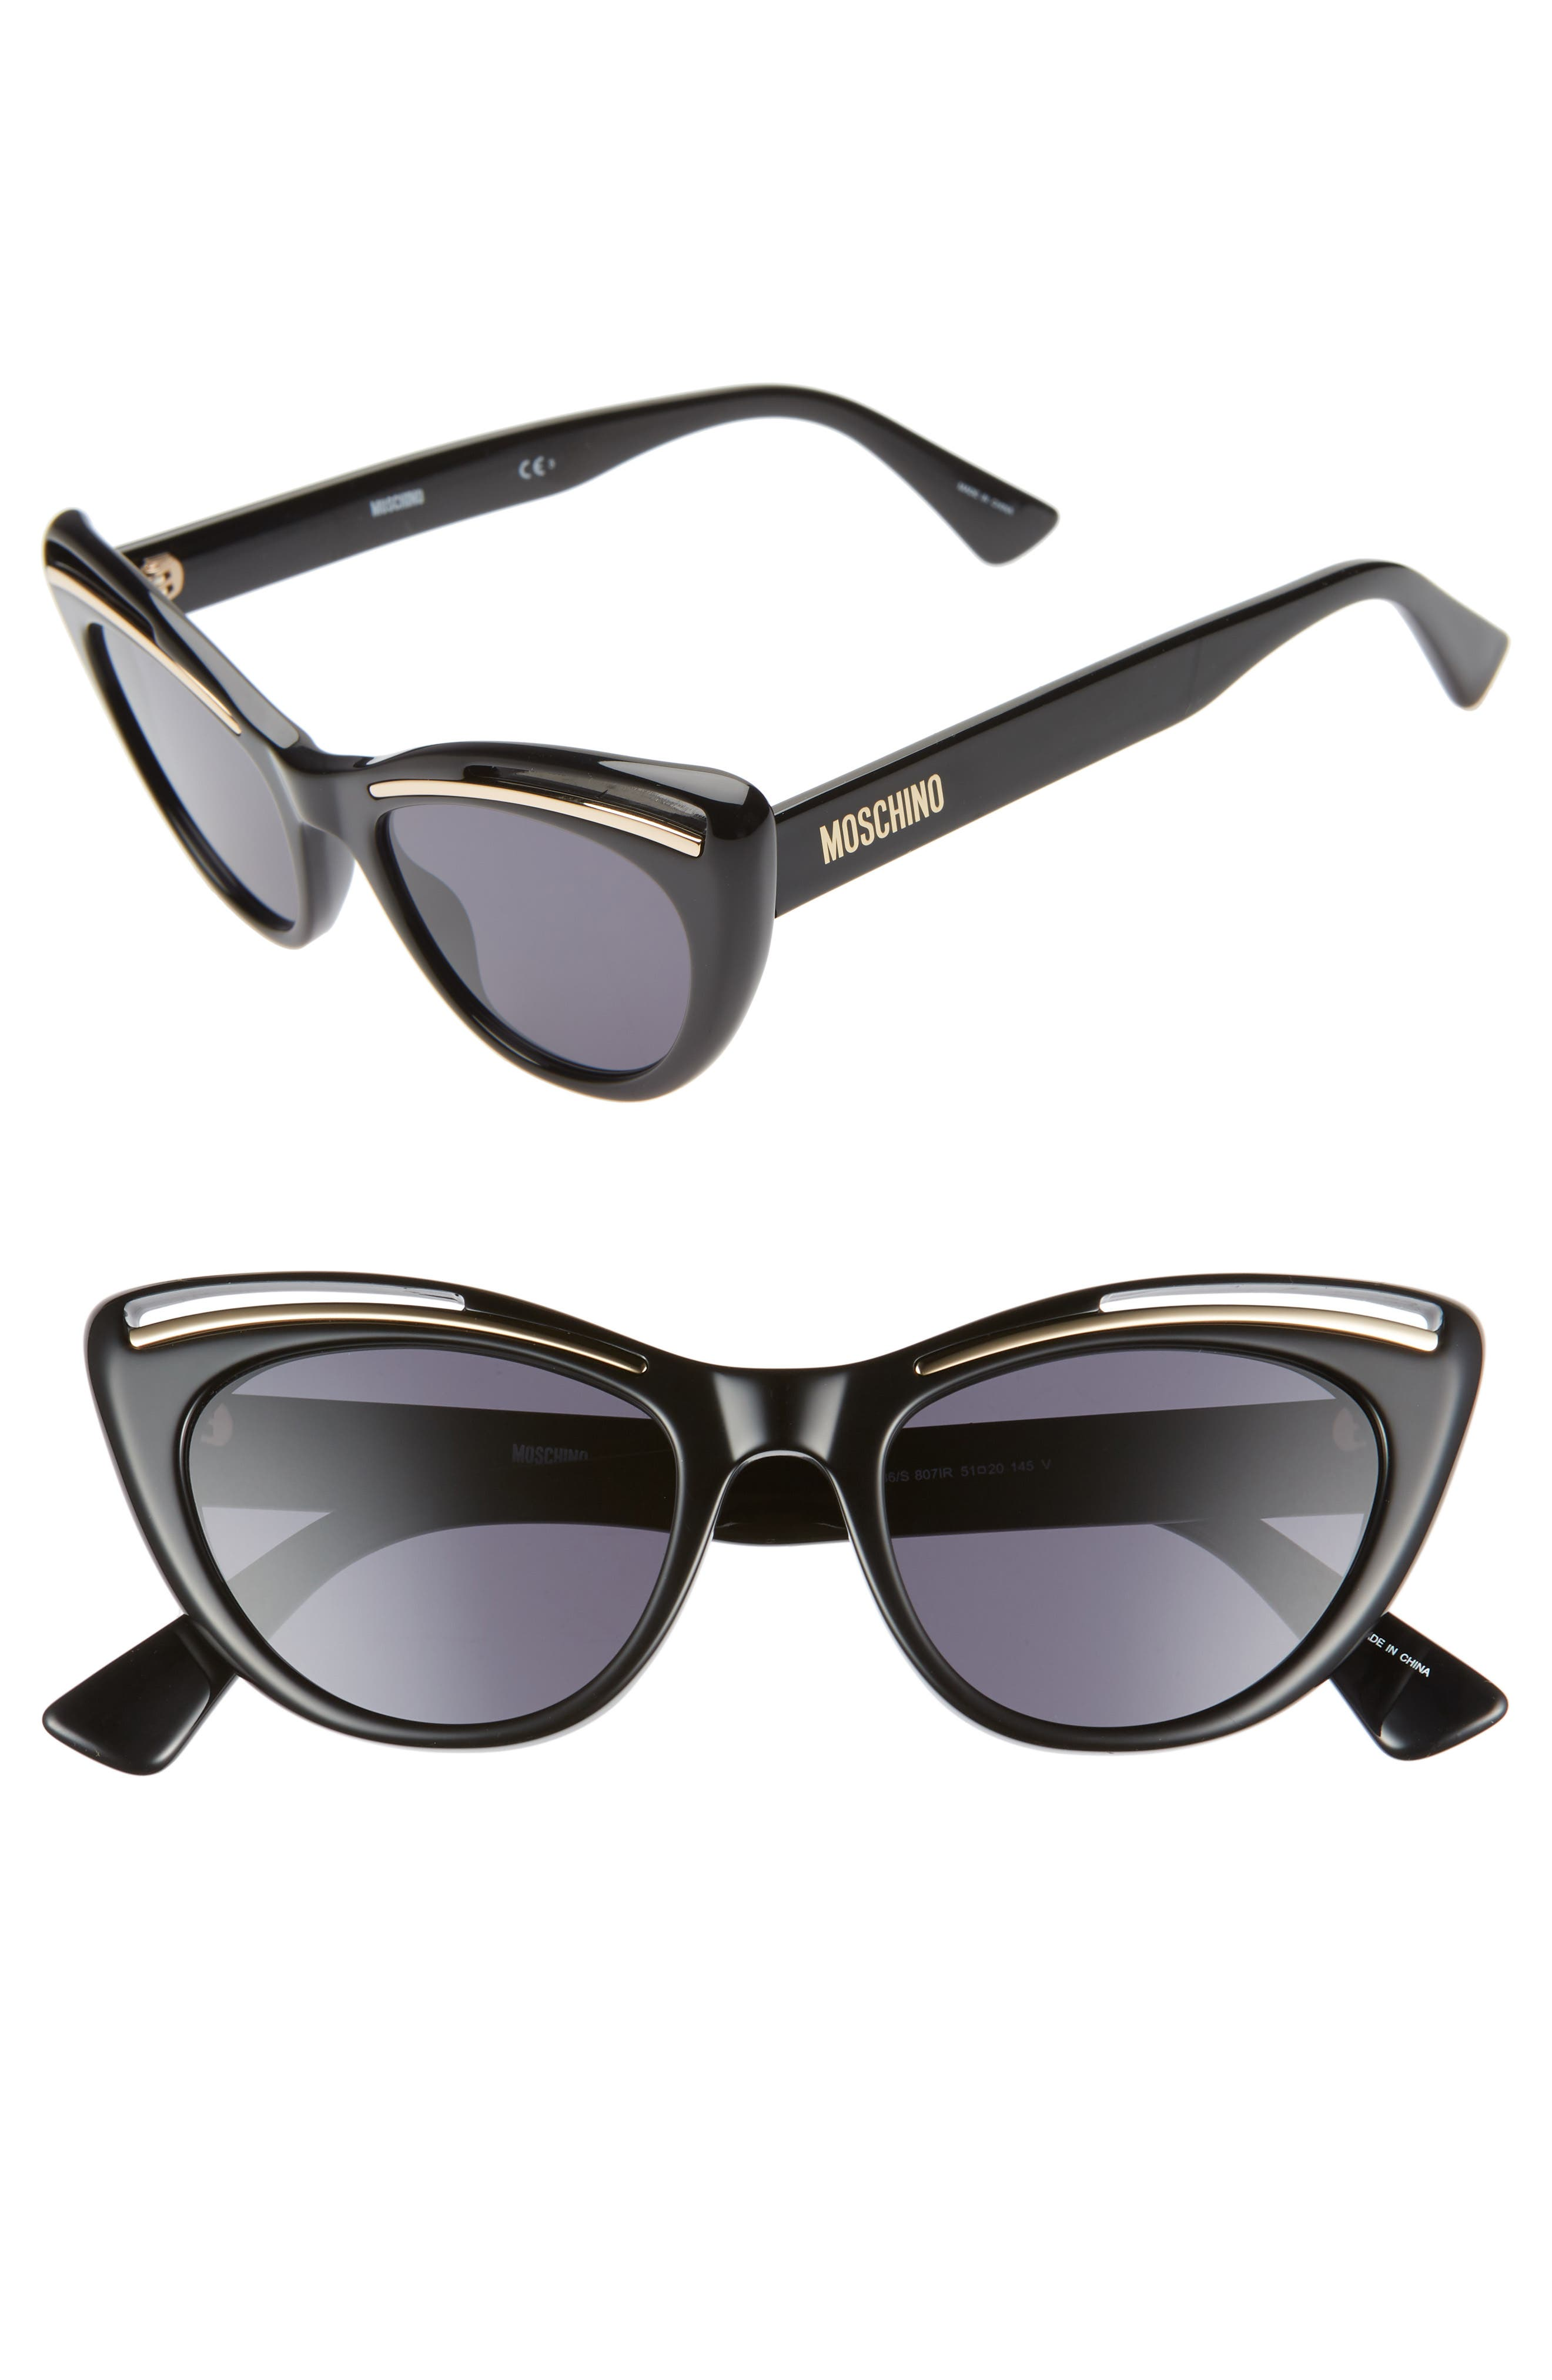 MOSCHINO, 51mm Cat Eye Sunglasses, Main thumbnail 1, color, BLACK